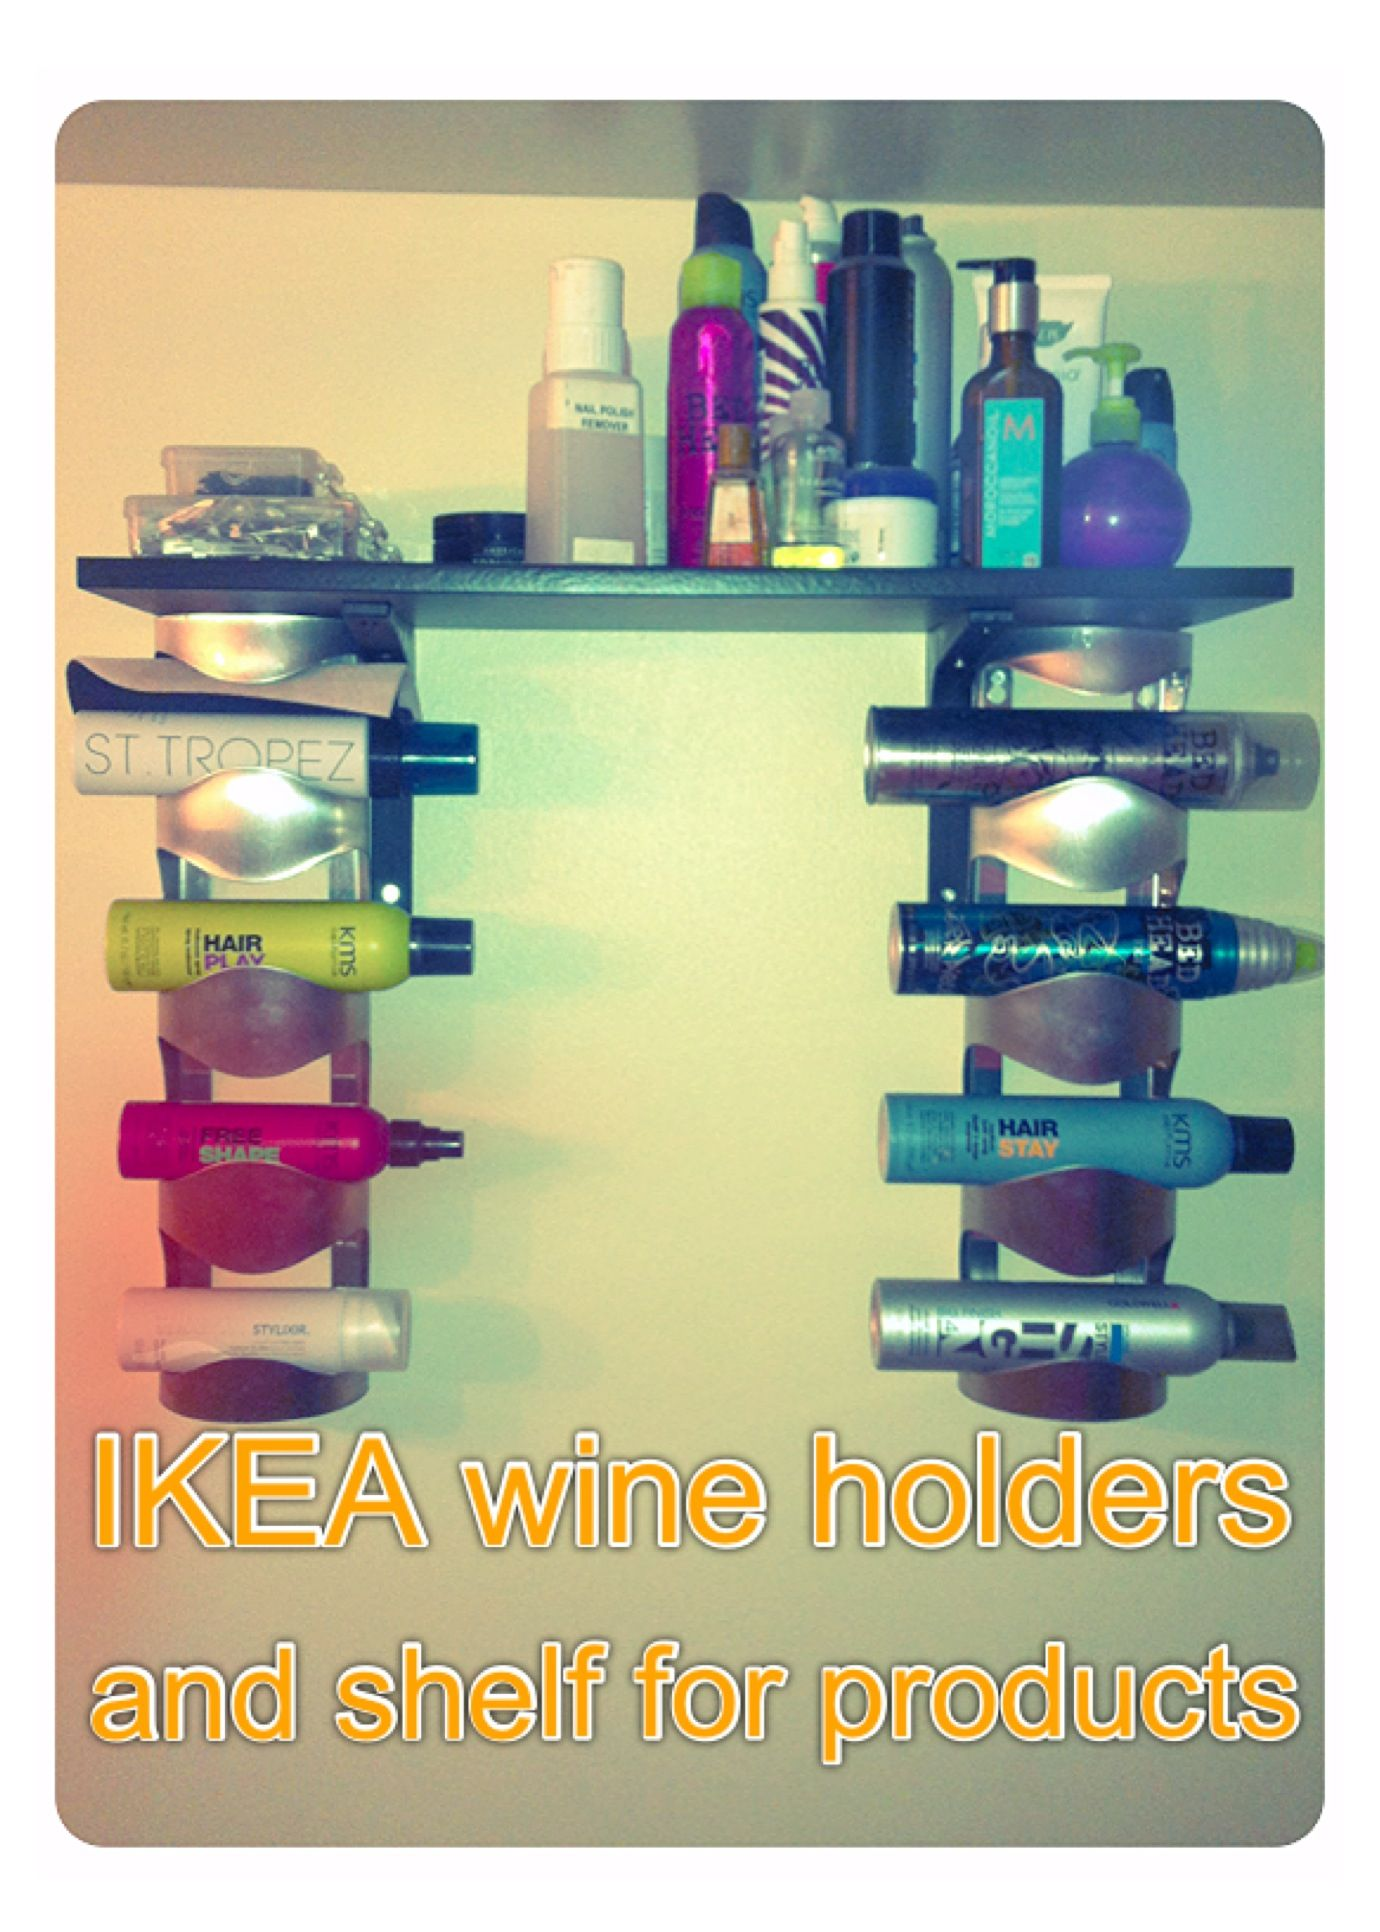 Ikea wine holders & shelf. Under $25.00 use for towels ...